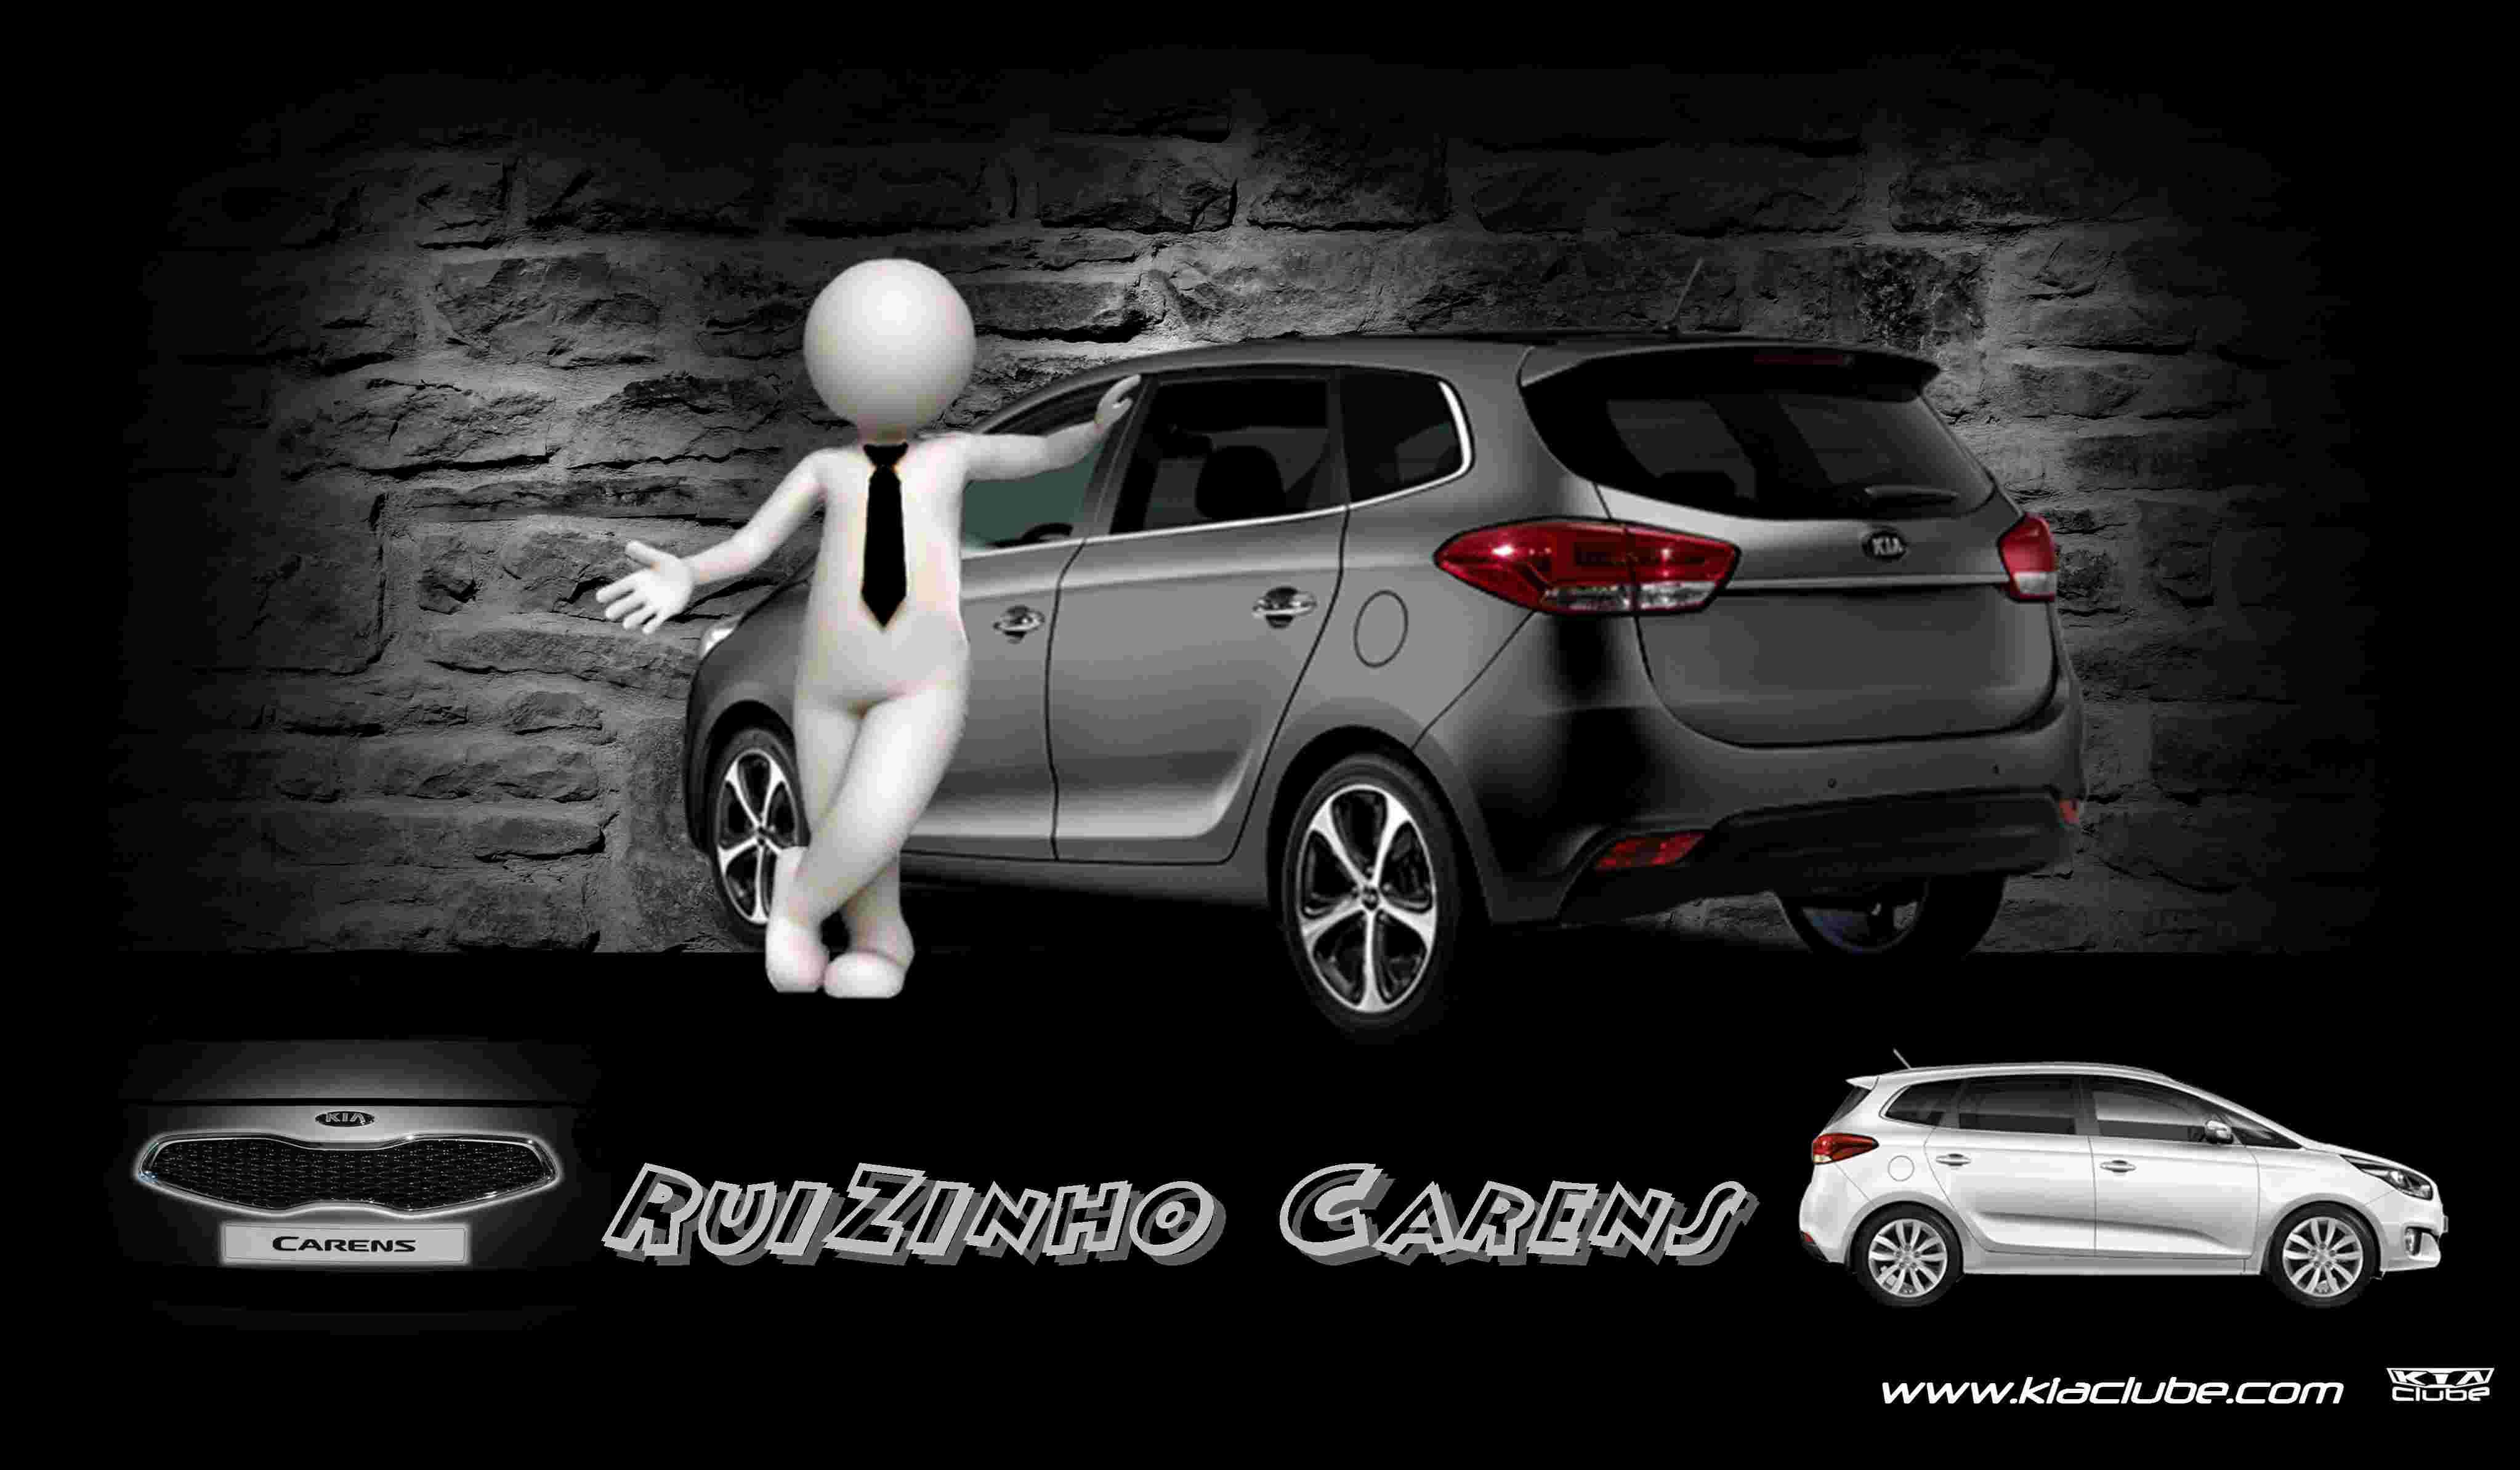 Kia Carens 1.7 TX CRDI 136cv e Kia Cee'd 1.6 CRDI 5p. - DO RUIZINHO  - Página 6 Ruizin10